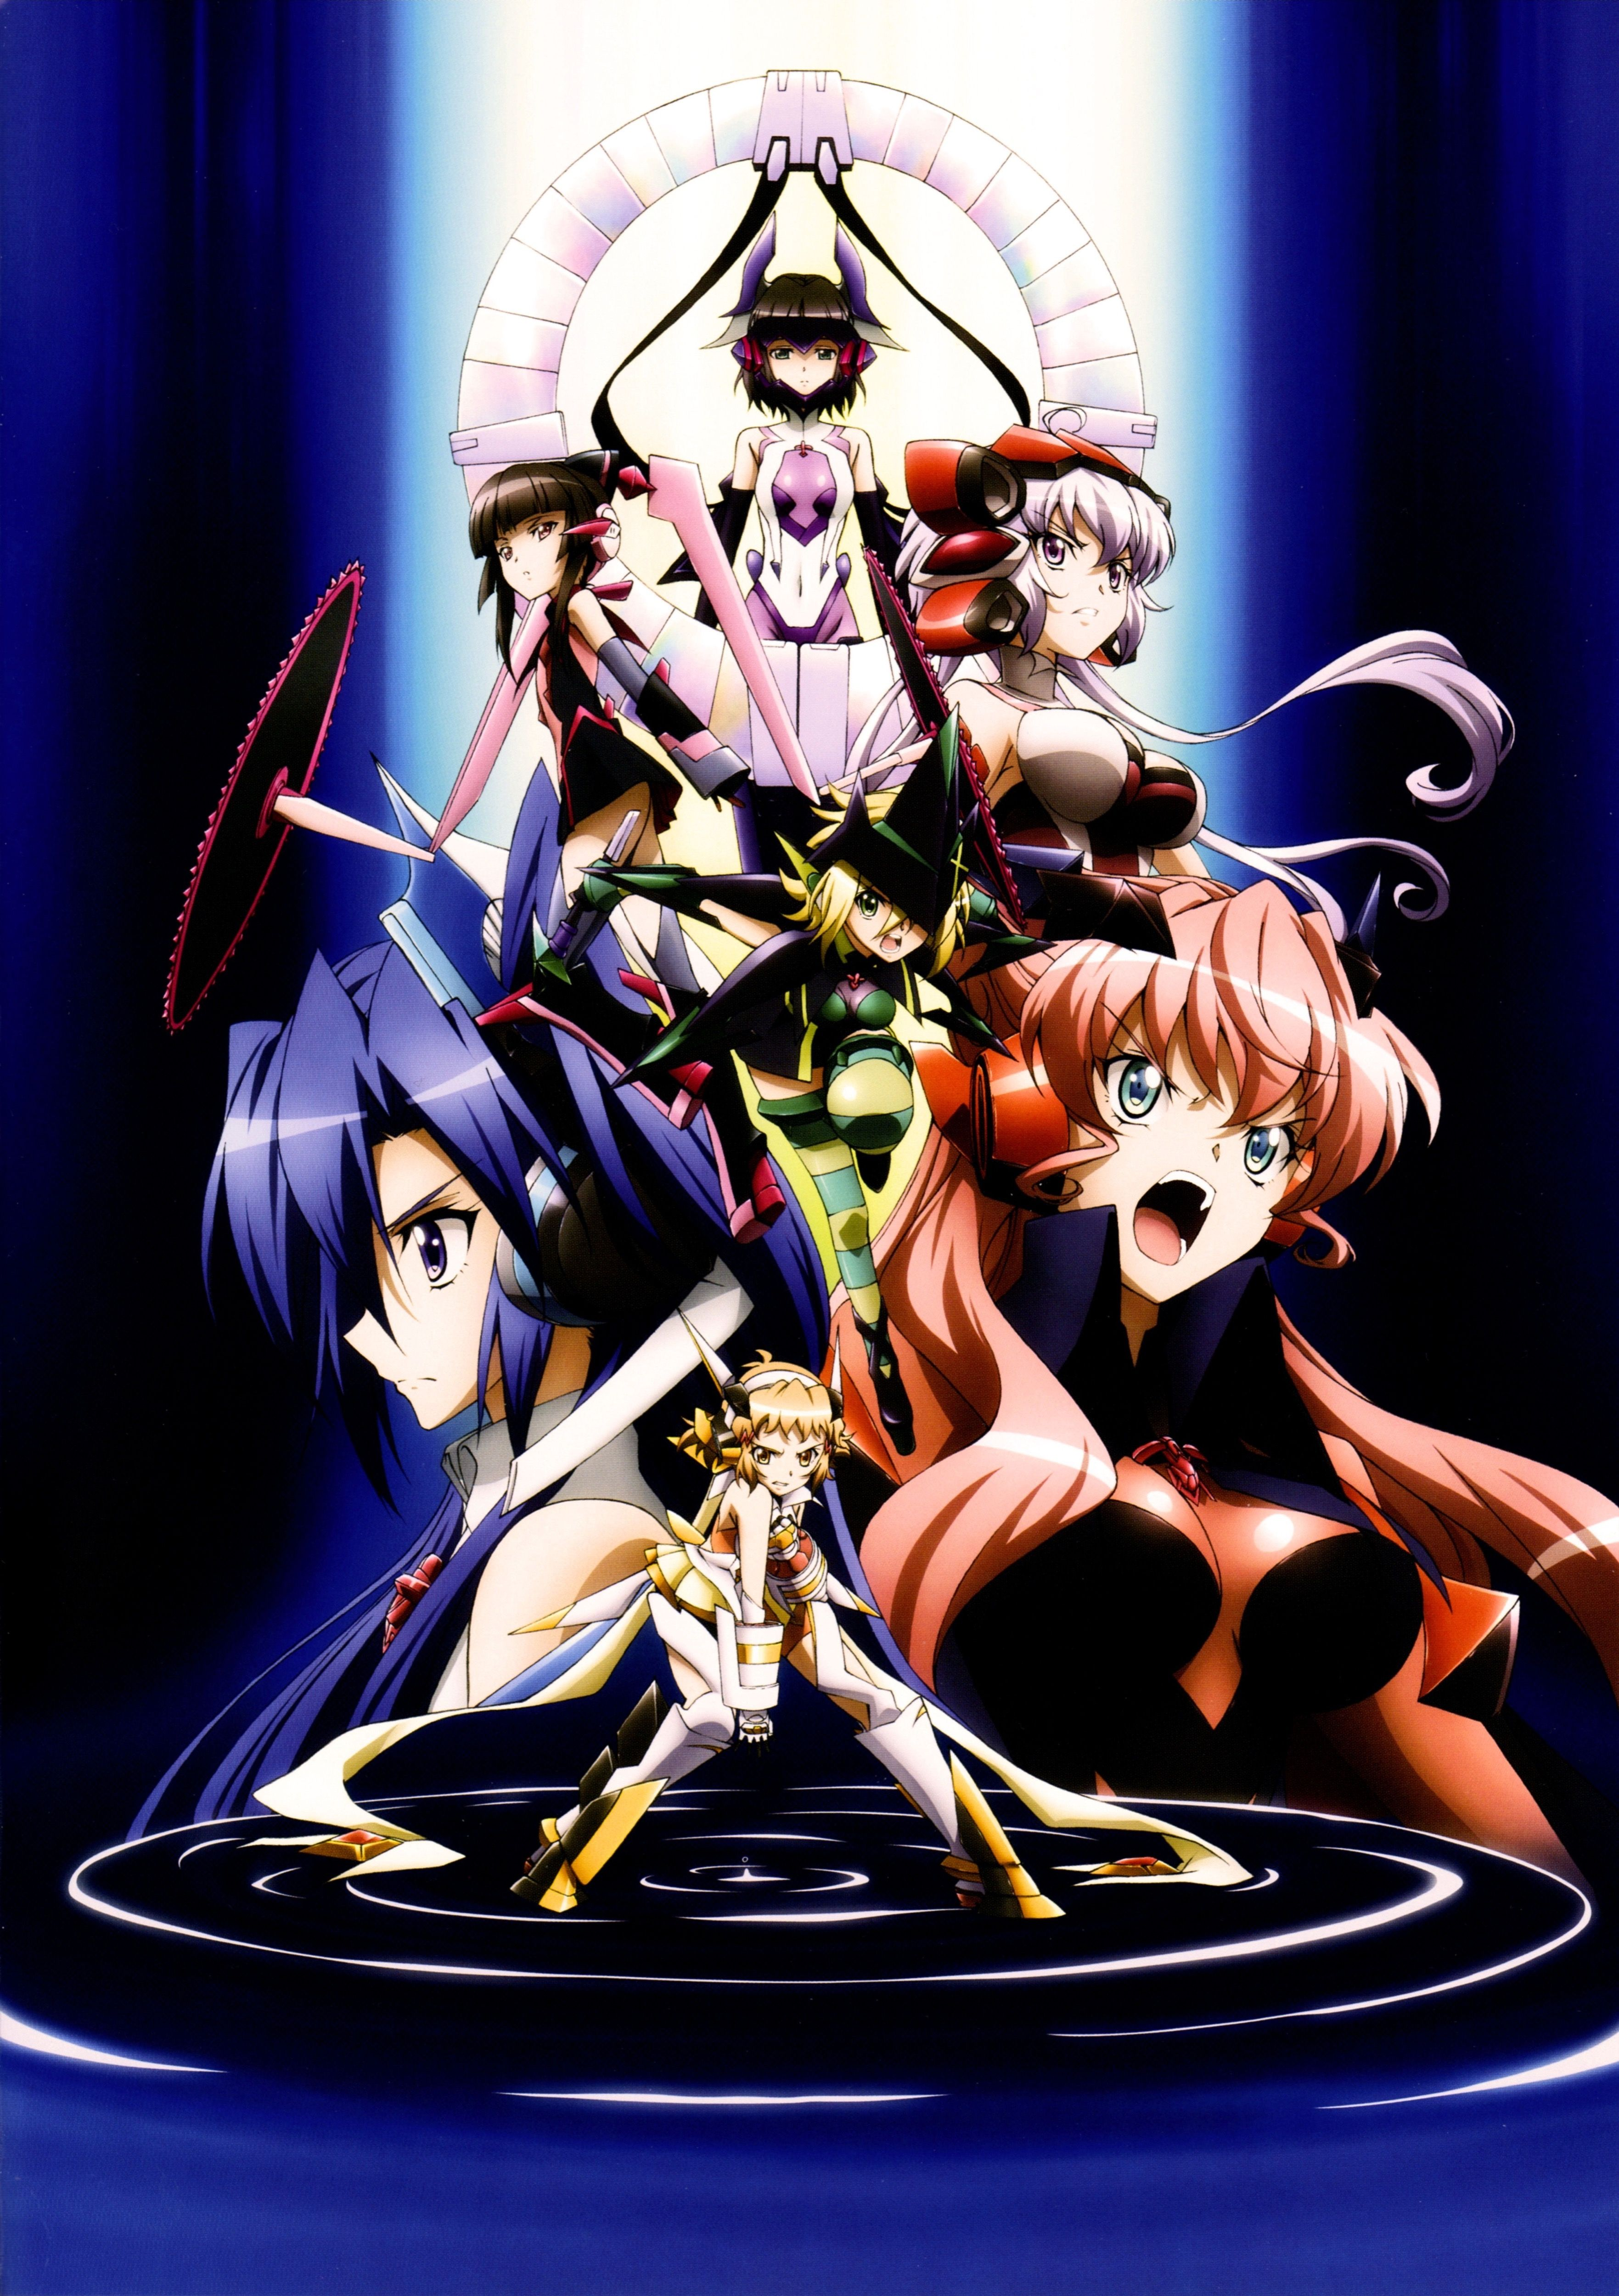 senki zesshou symphogear Part 2 J5NDEF/100 Anime